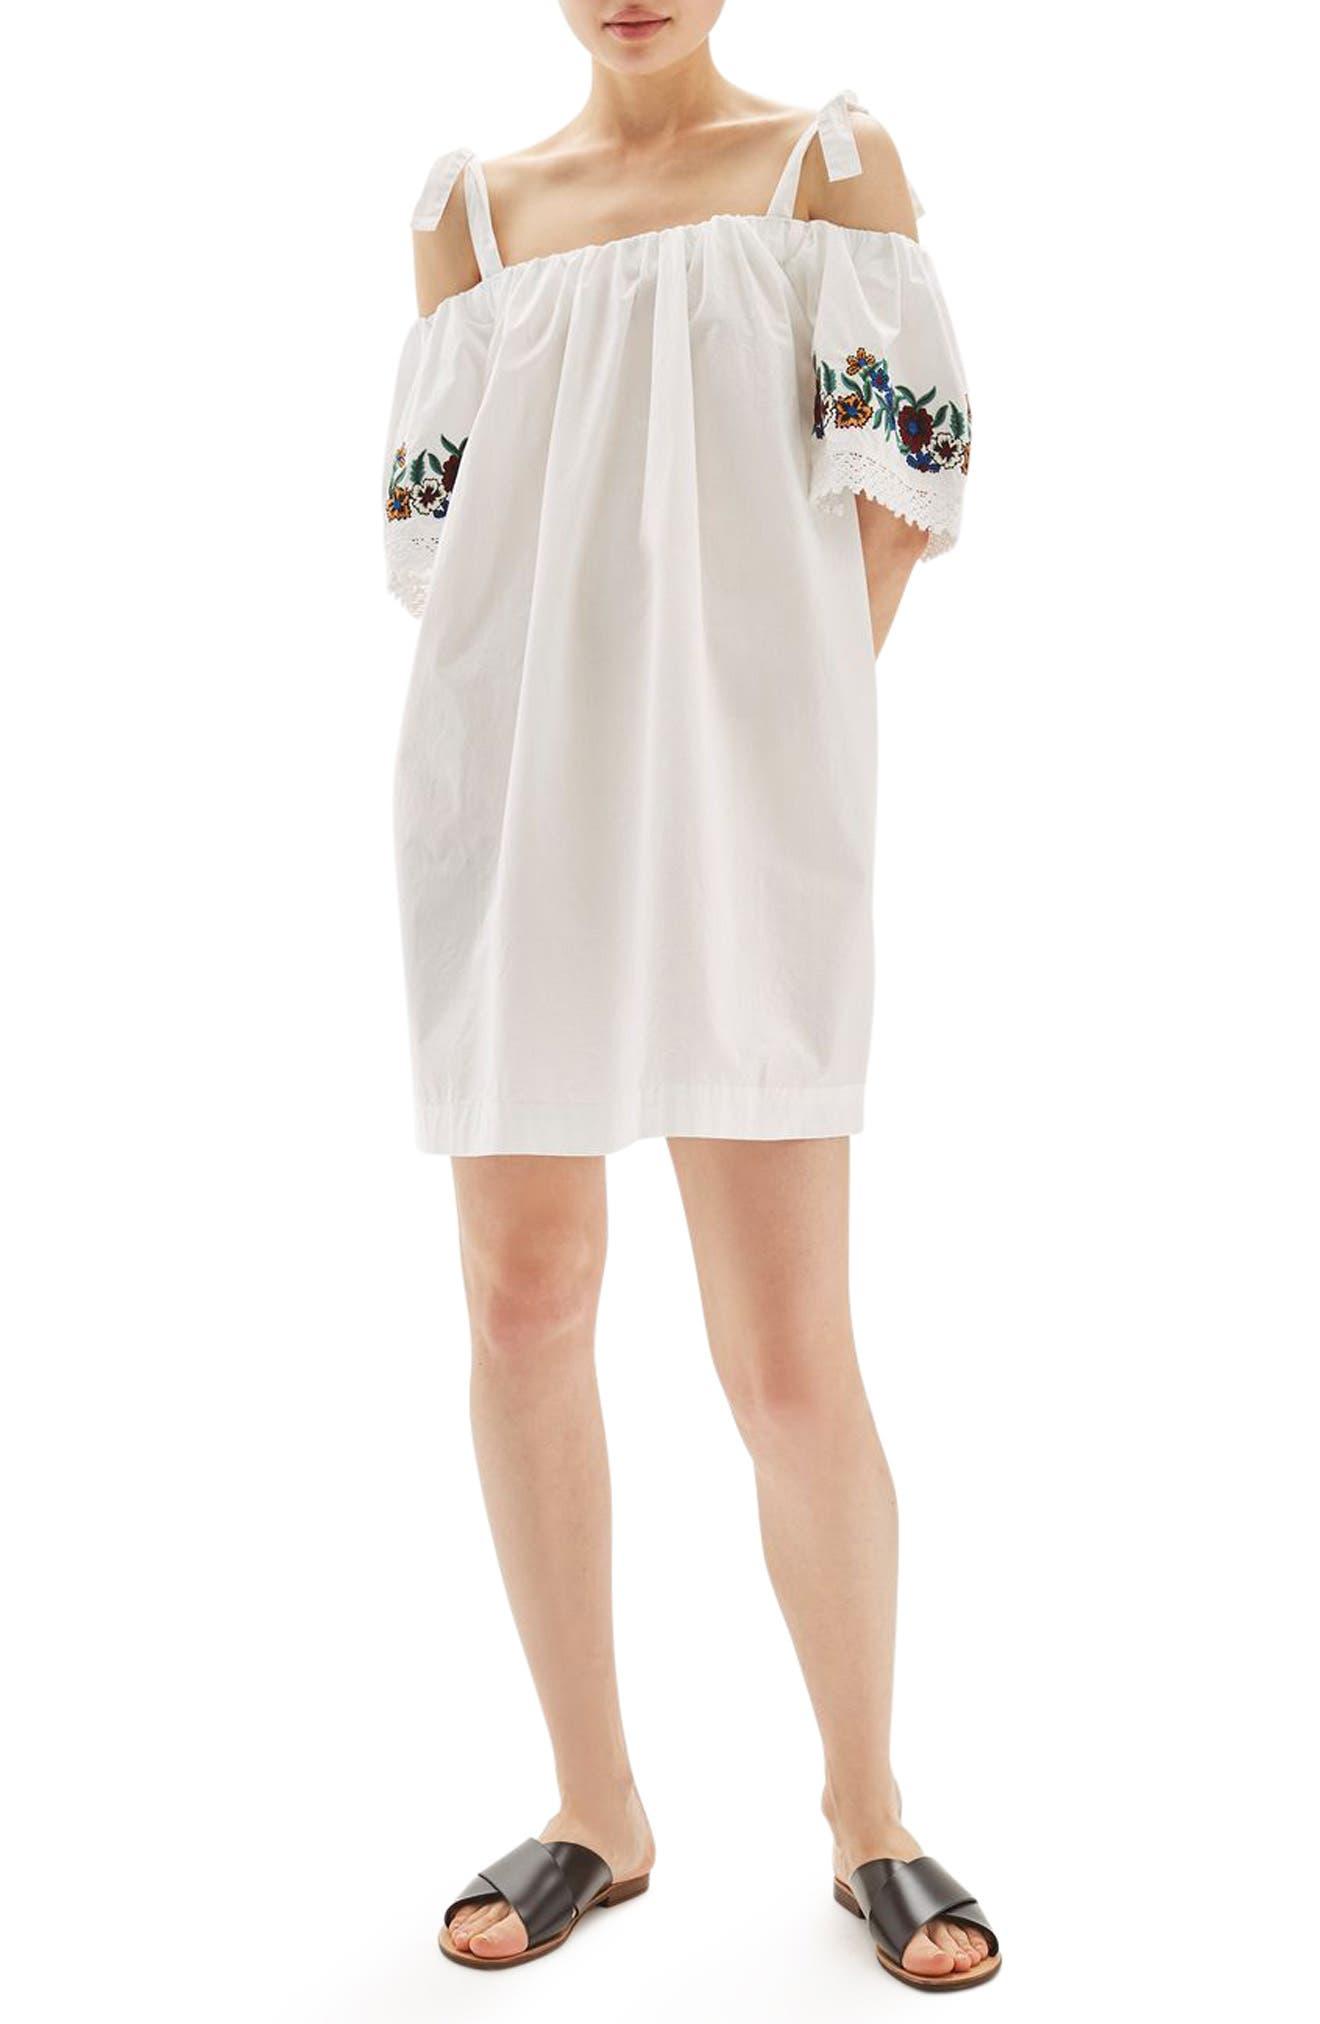 Alternate Image 1 Selected - Topshop Bardot Embroidered Dress